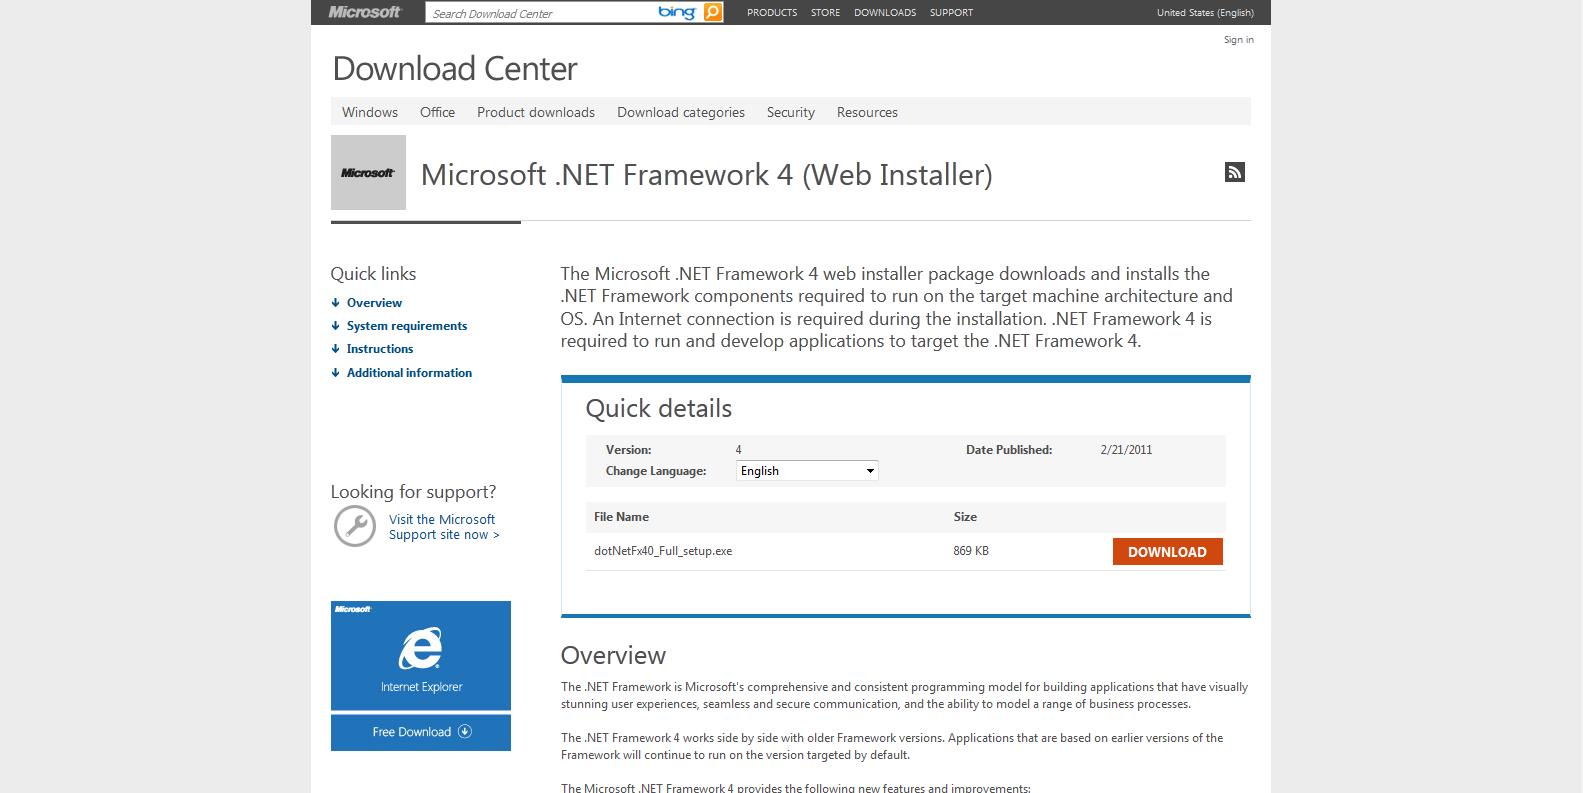 Microsoft .Net Framework 4.0 Install Video Guide - http://www.youtube.com/watch?v=NRVUFG_FjzU